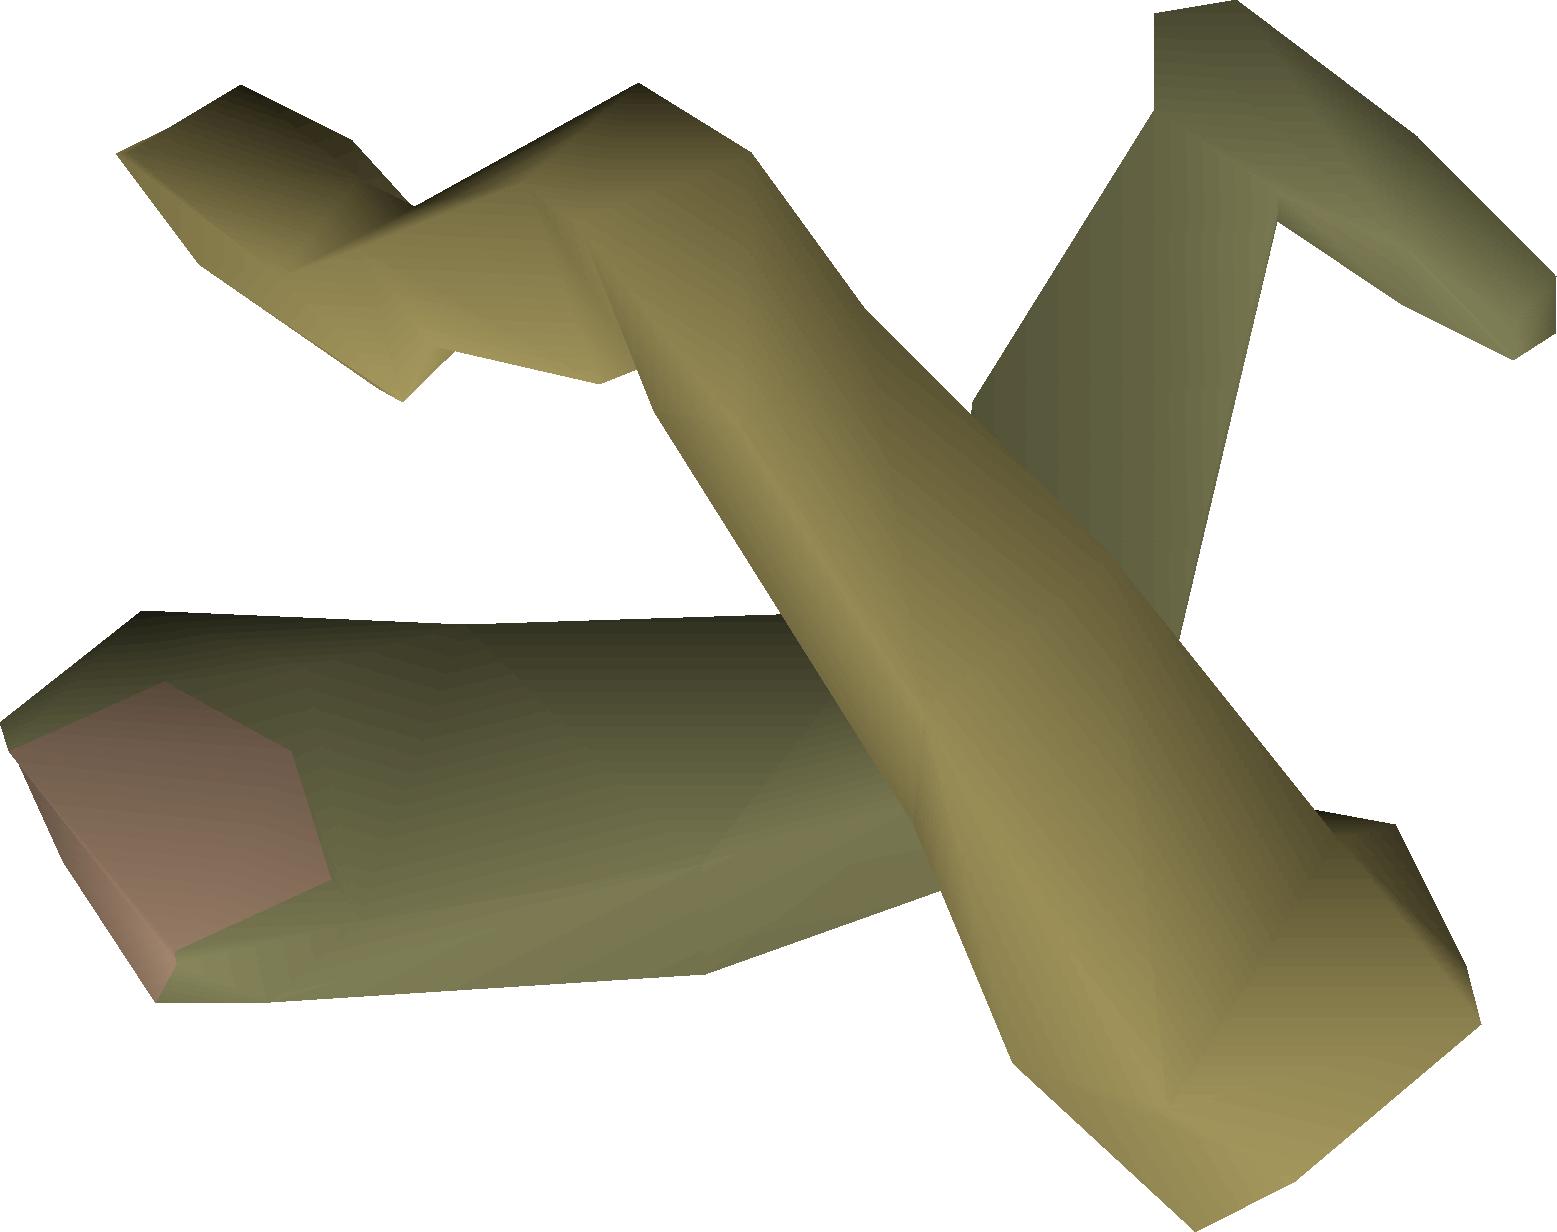 Legs detail